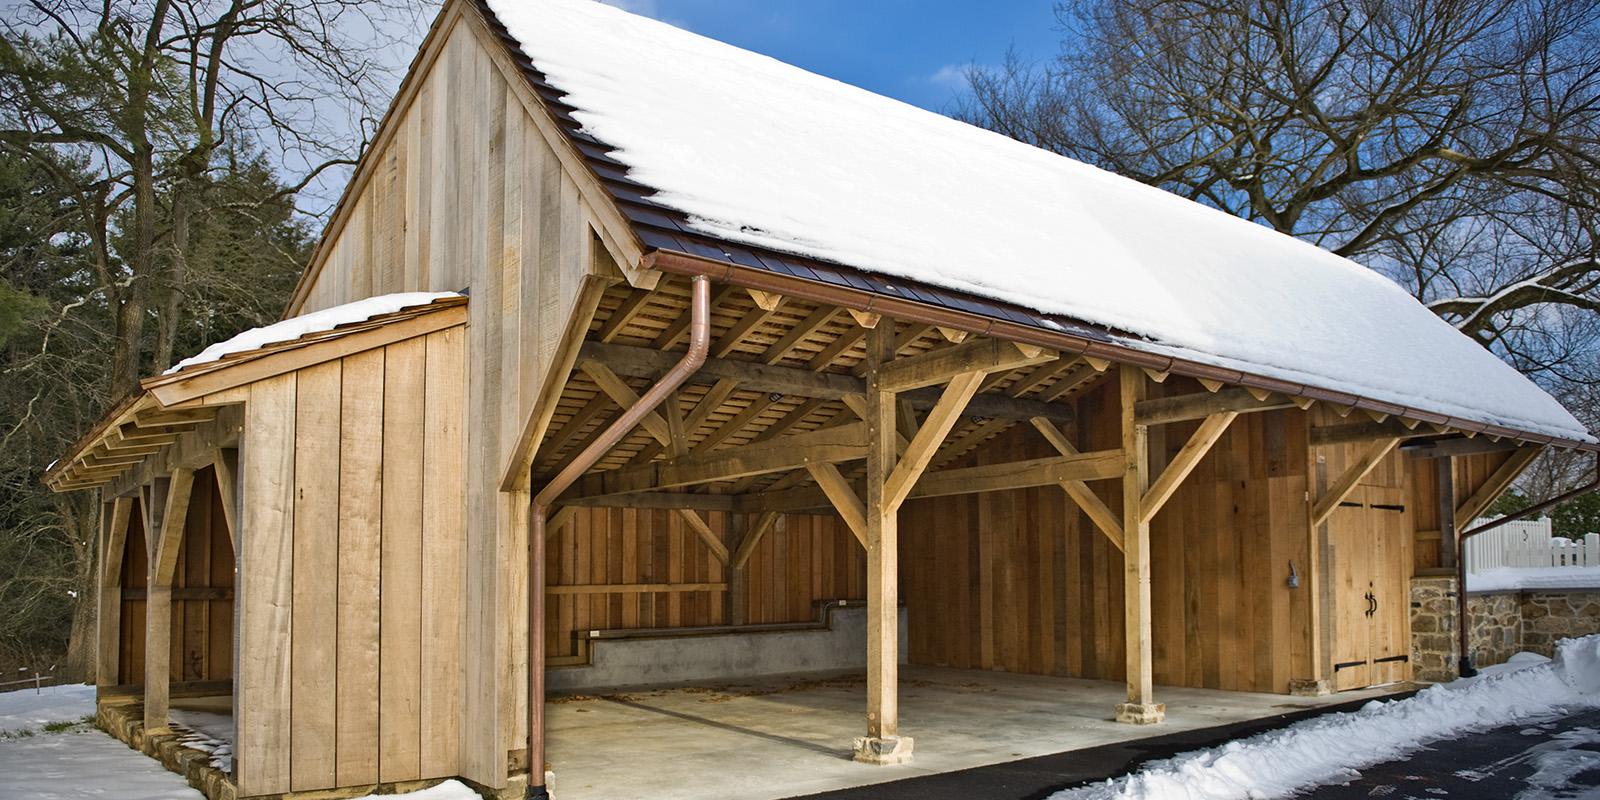 Hugh Lofting Timber Framing Inc. – Precision. Craft. Legacy.